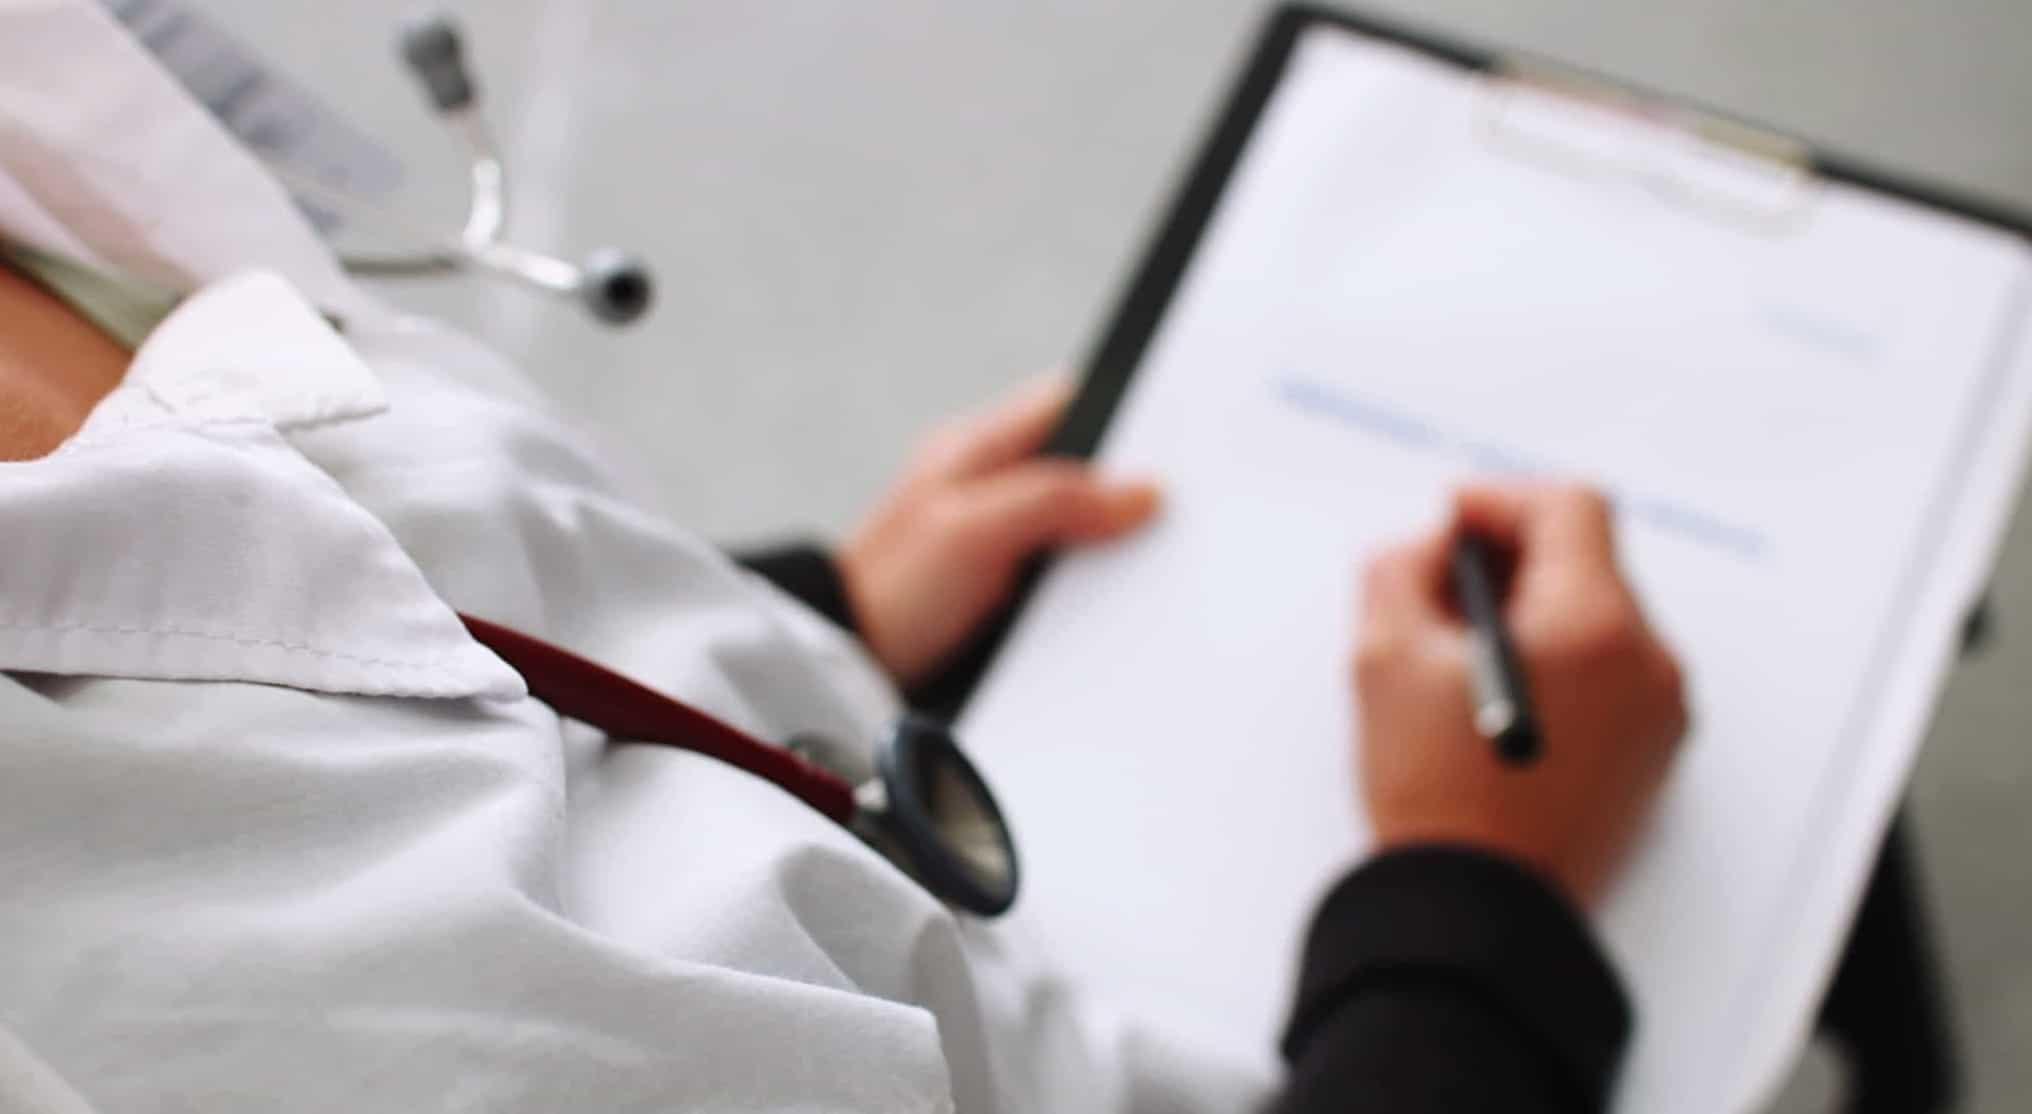 Médica a assinar papéis